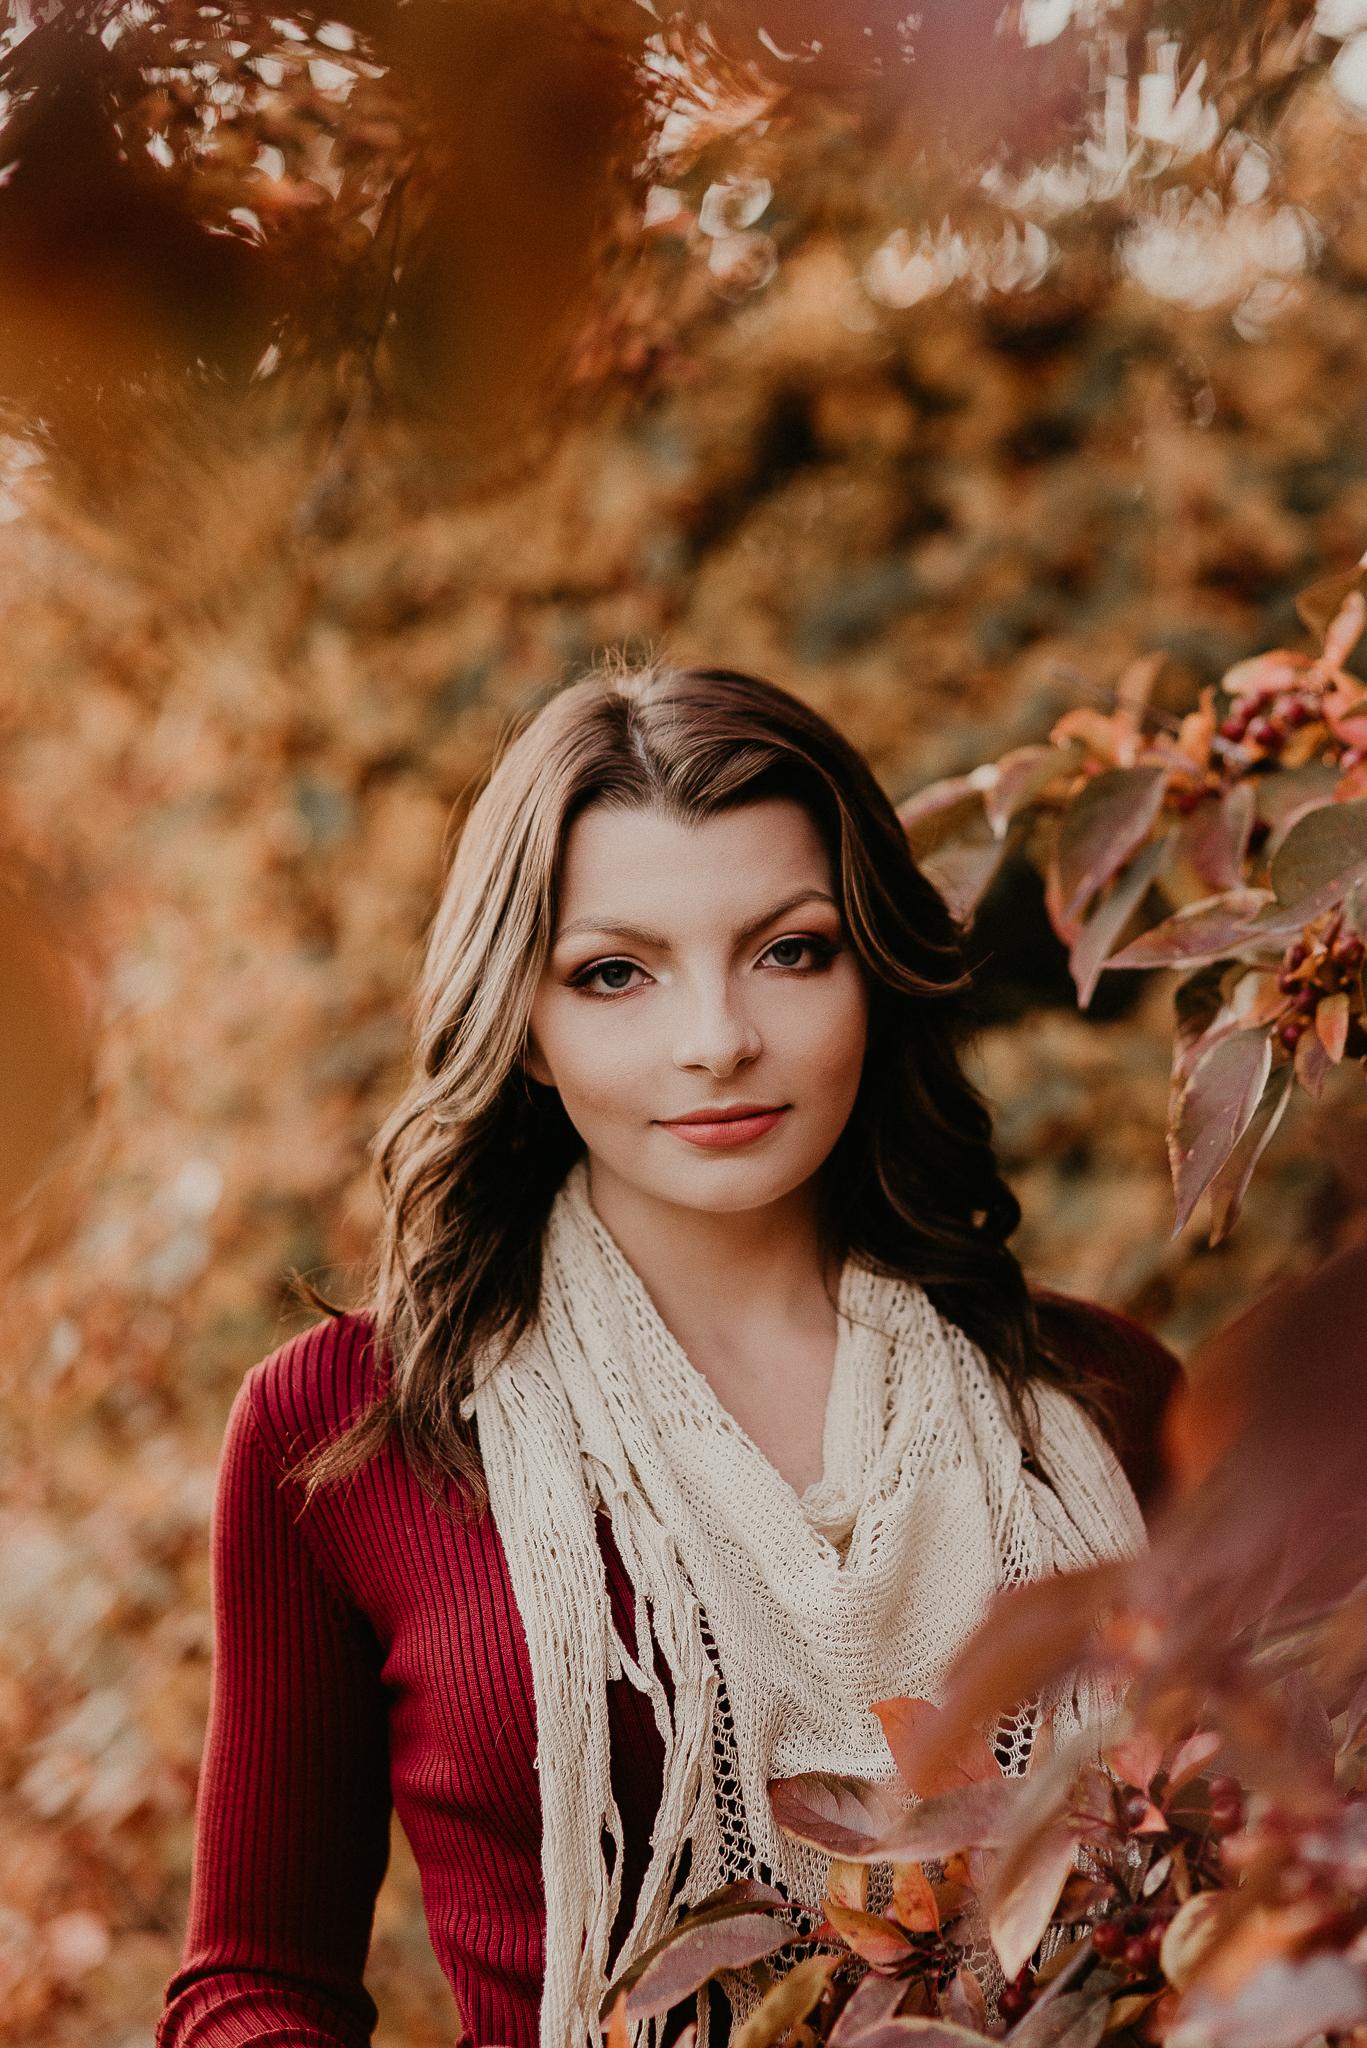 Boise Senior Photographer Makayla Madden Photography Best Unique Award Winning Fall Winter Senior Pictures Kuna Meridian Senior Photography